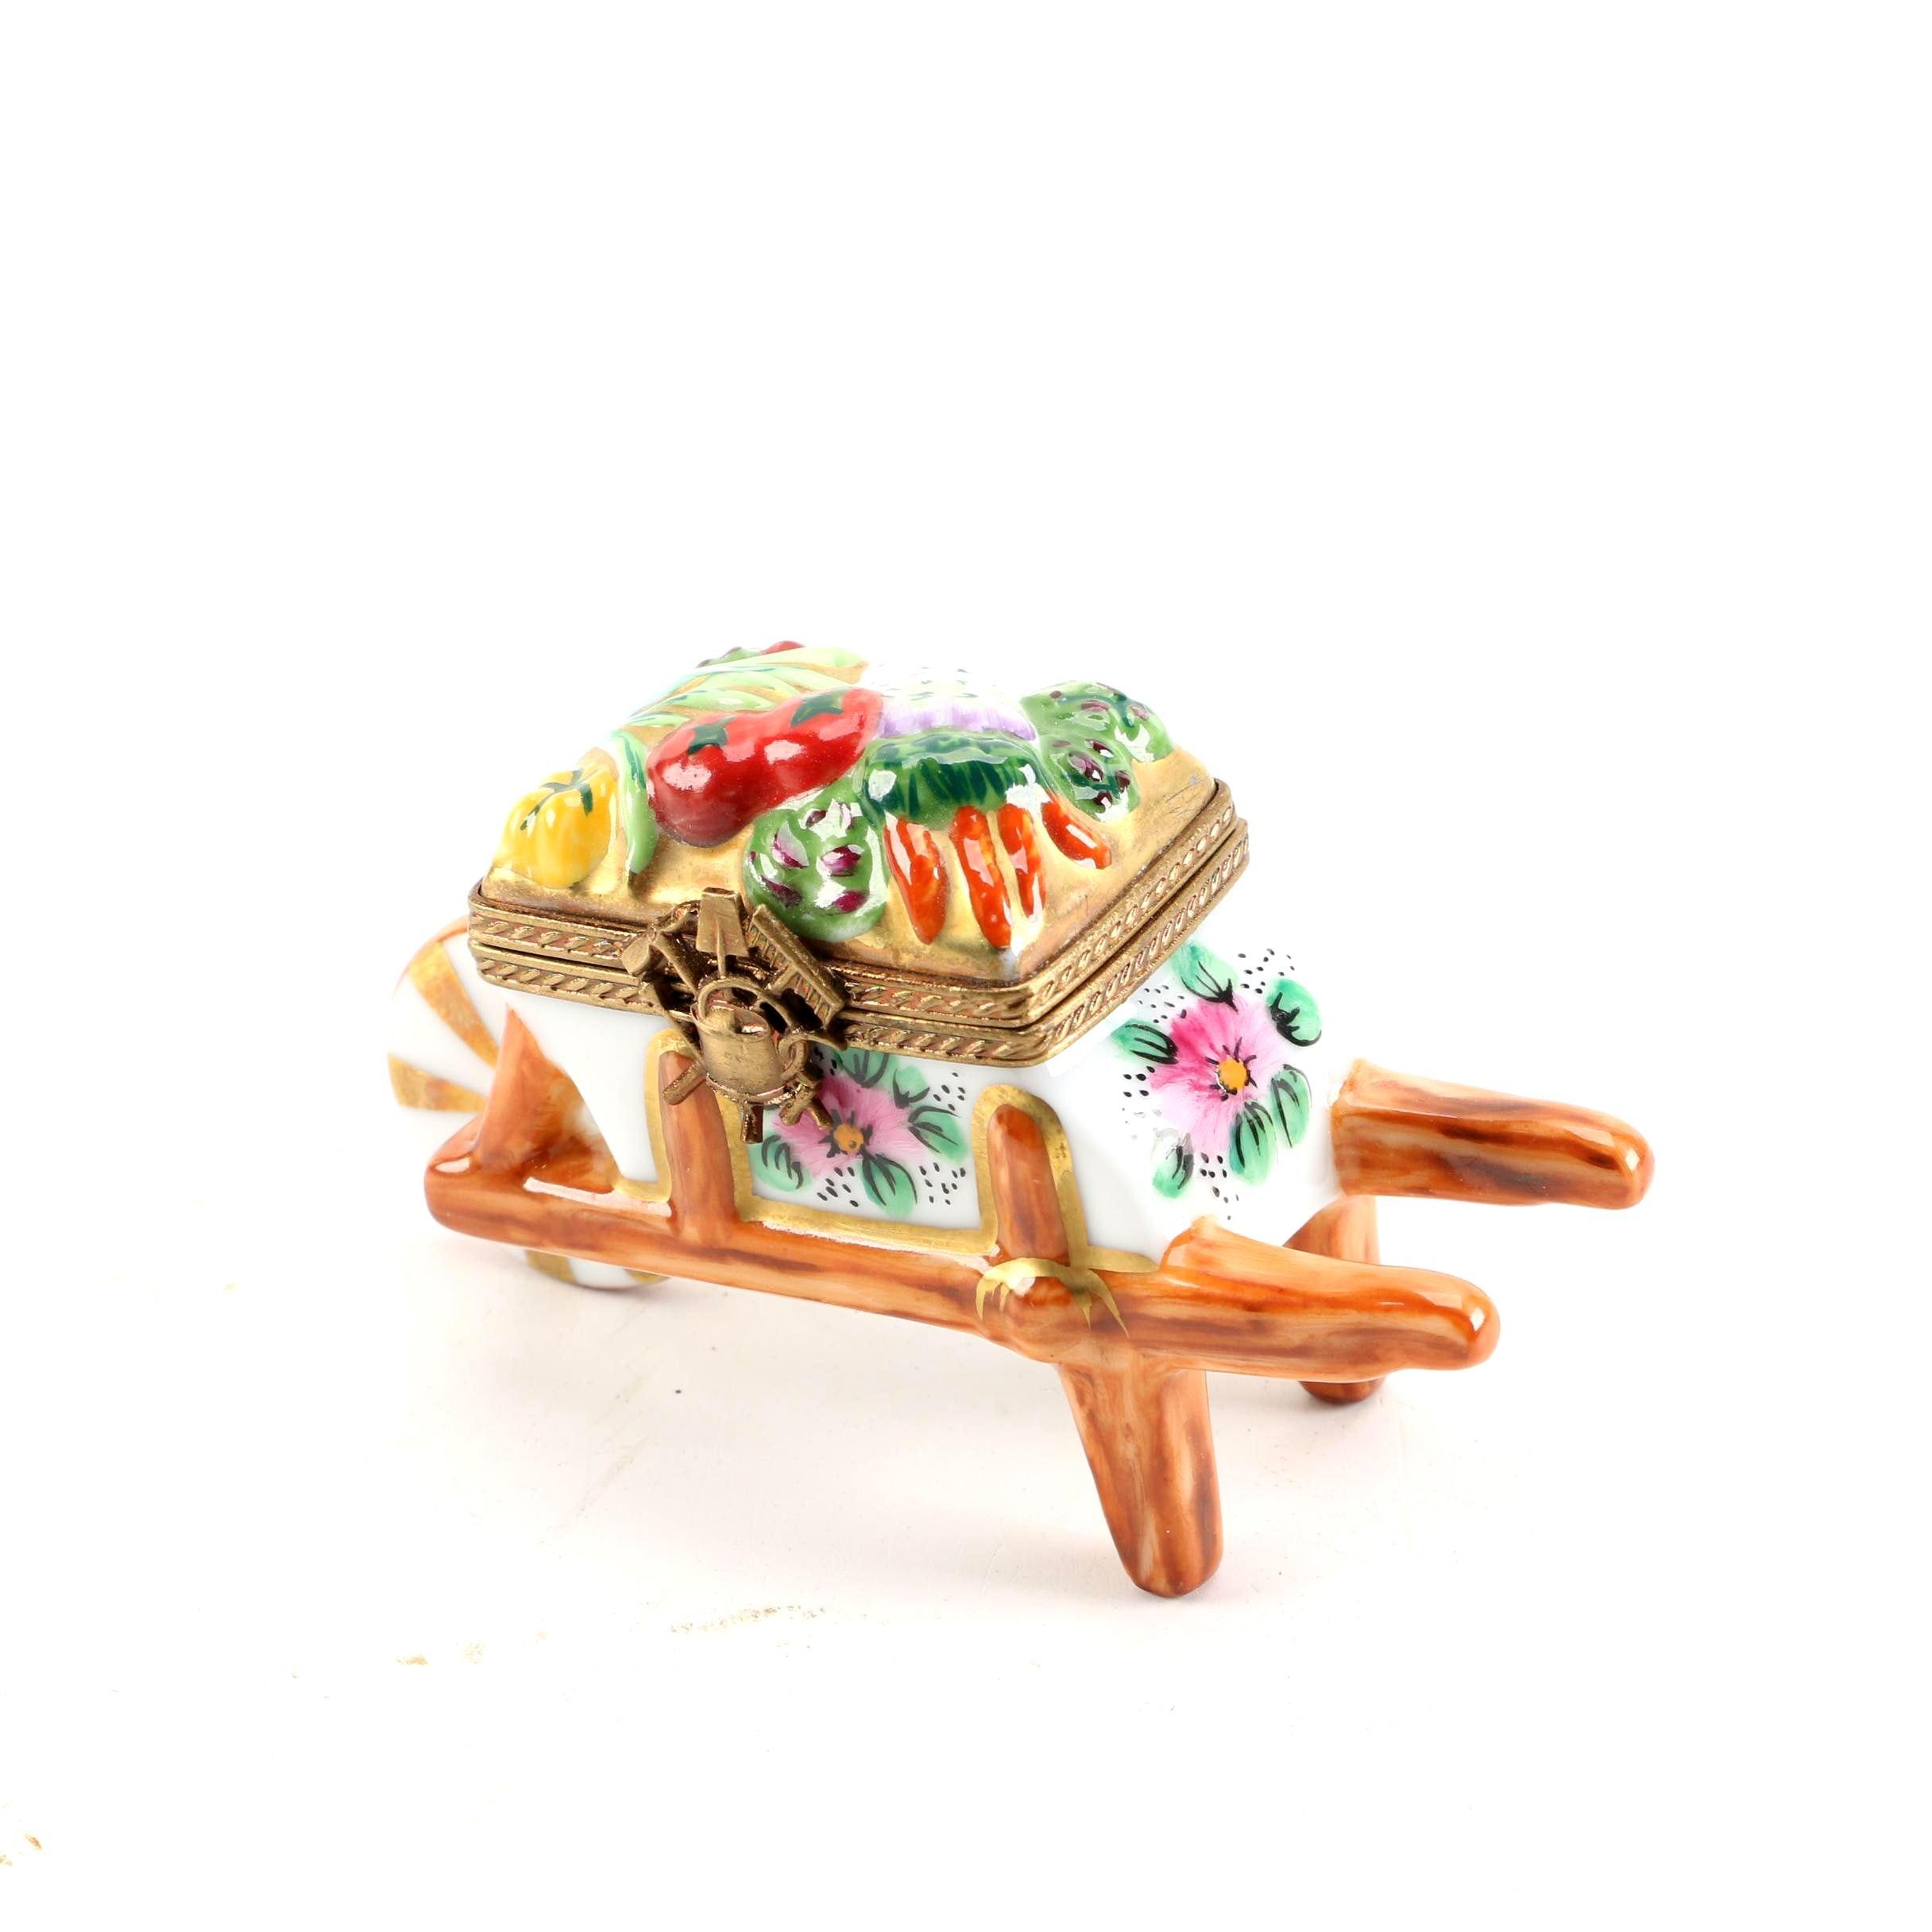 Limoges Hand-Painted Porcelain Wheelbarrow Themed Trinket Box